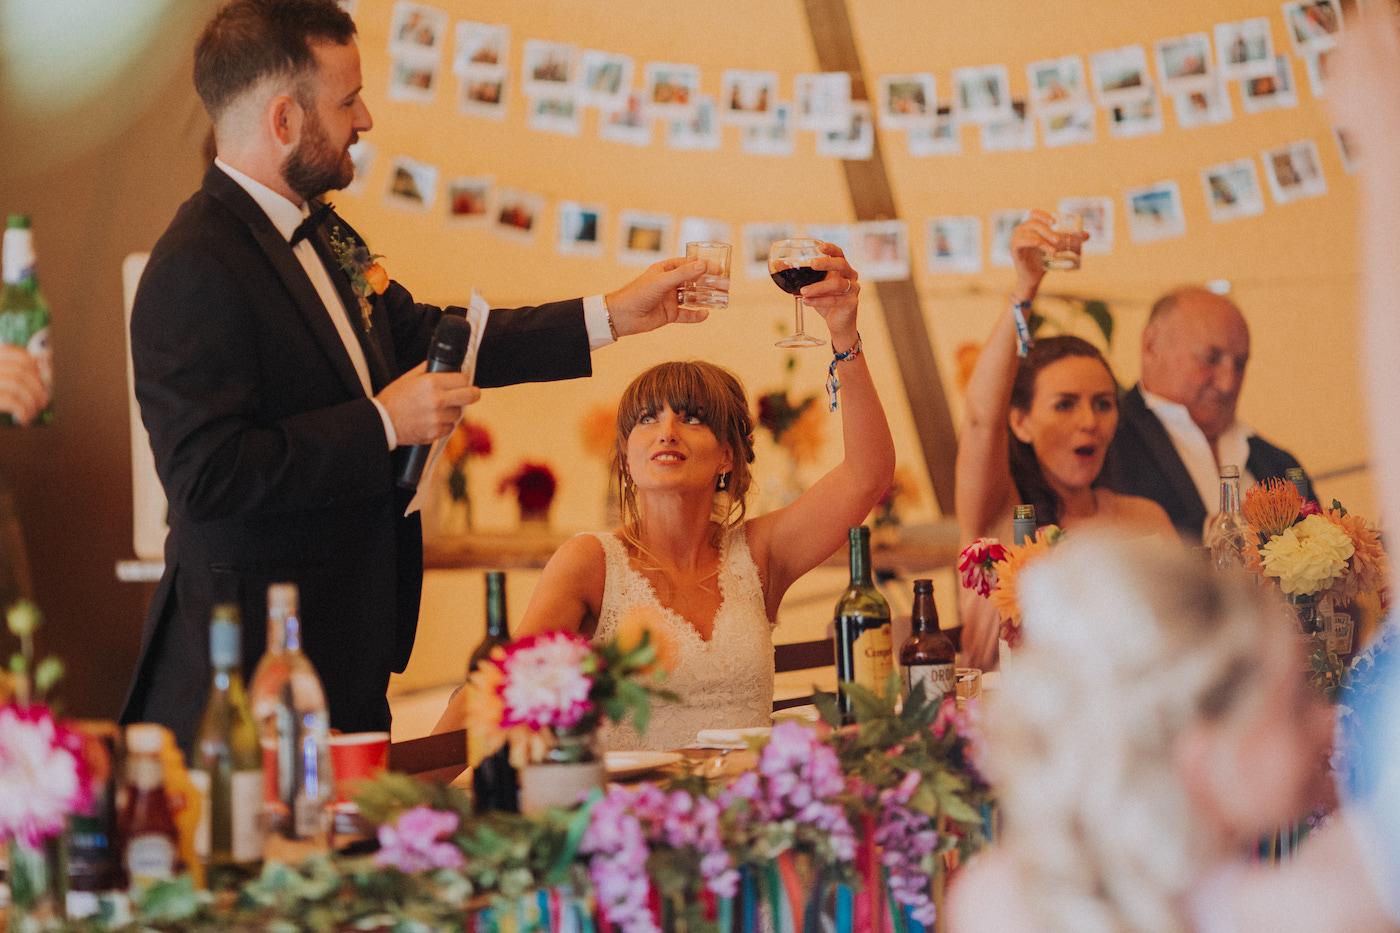 kellyfest festival wedding wedfest